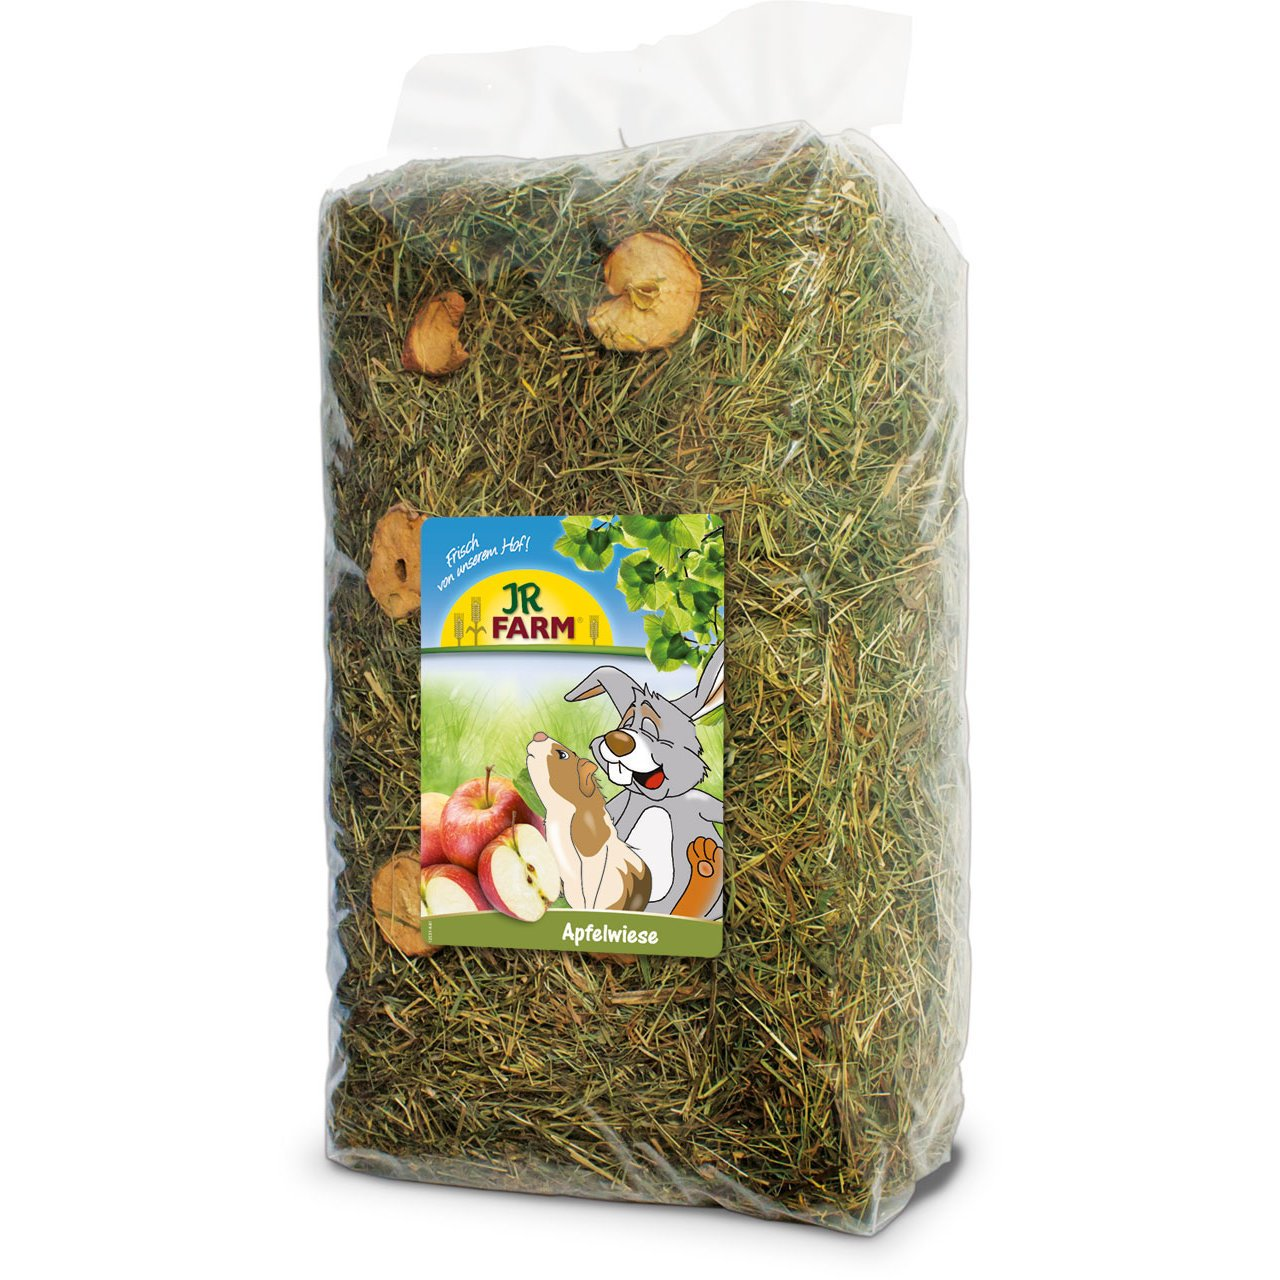 JR Farm Premium Heu Kräuterwiese, Apfelwiese, 1,5 kg